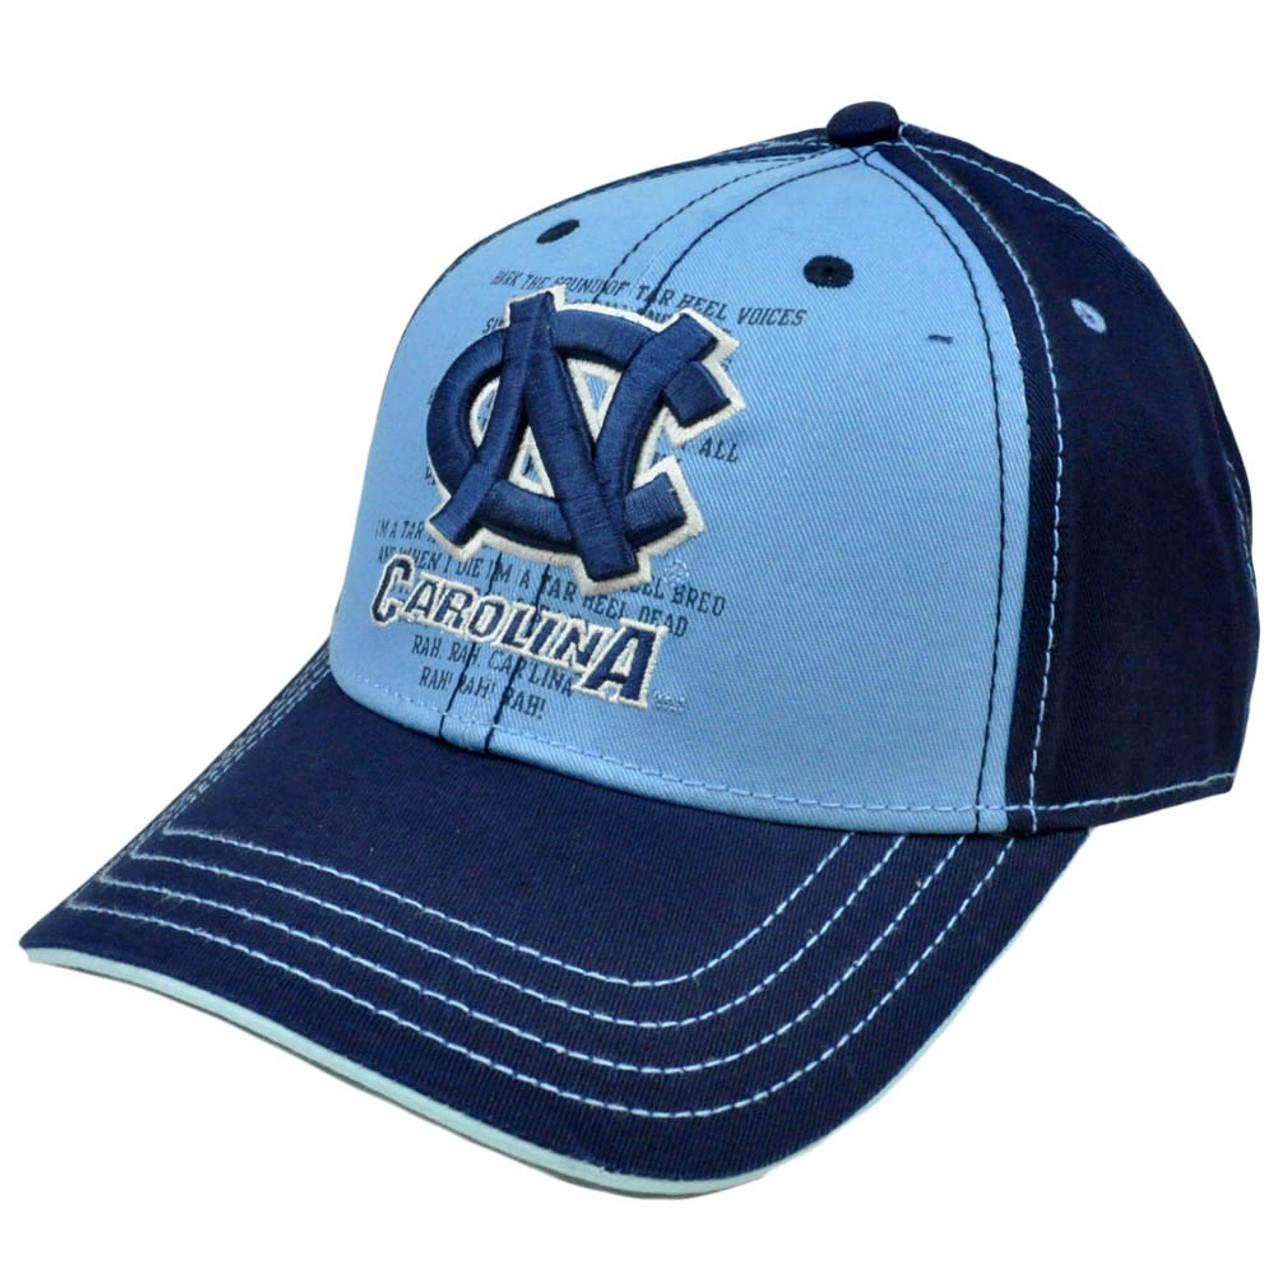 b0bf21411a NCAA Cap Hat Constructed North Carolina Tar Heels Fight Song Chino  Adjustable